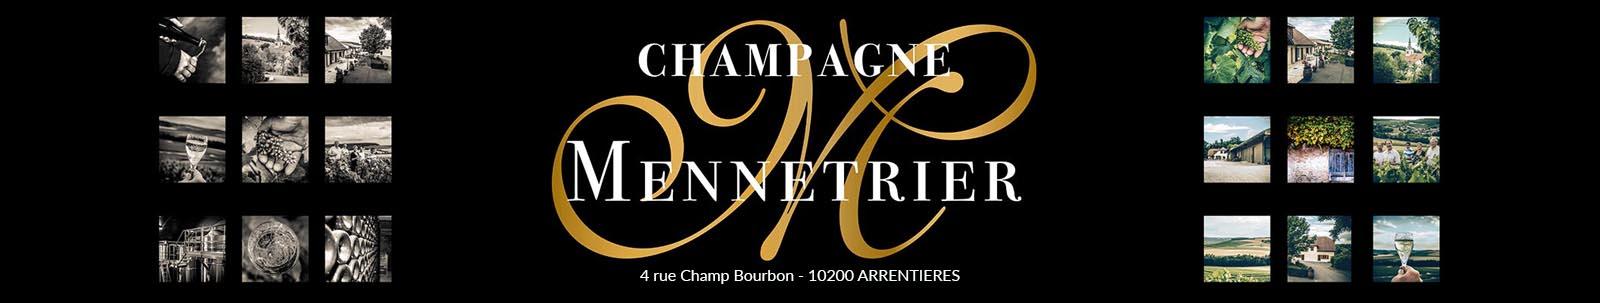 Champagne Mennetrier